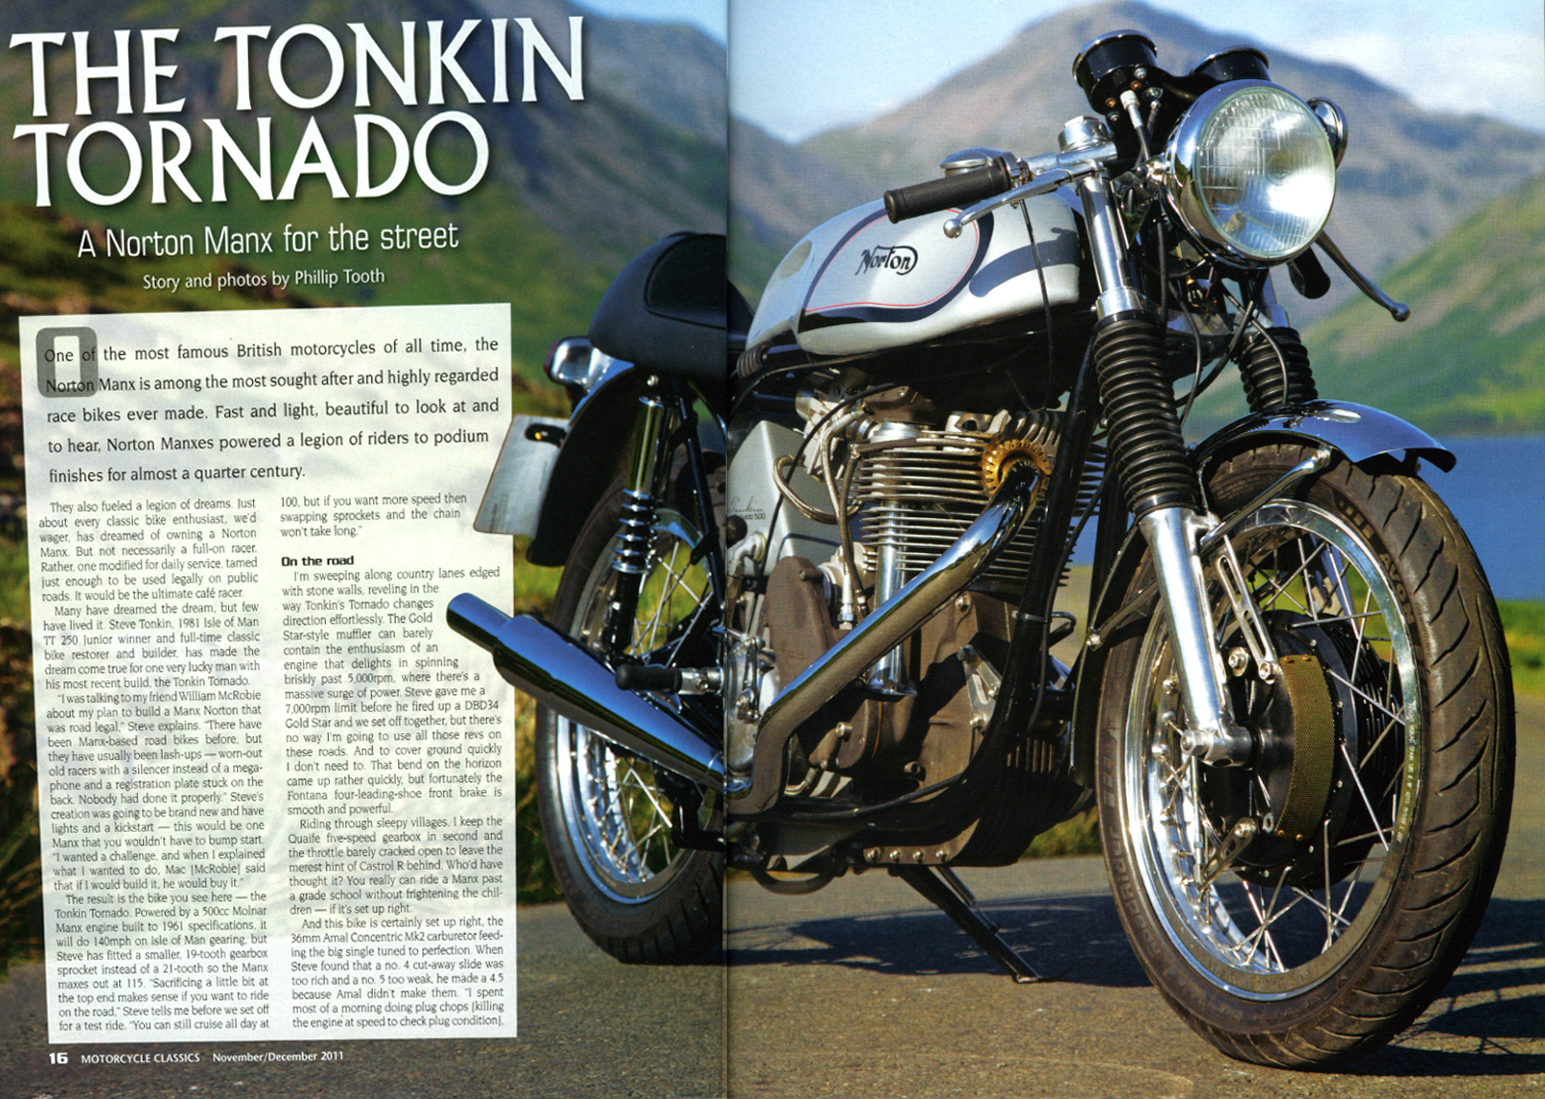 Motorcycle classics double spread 1.jpg